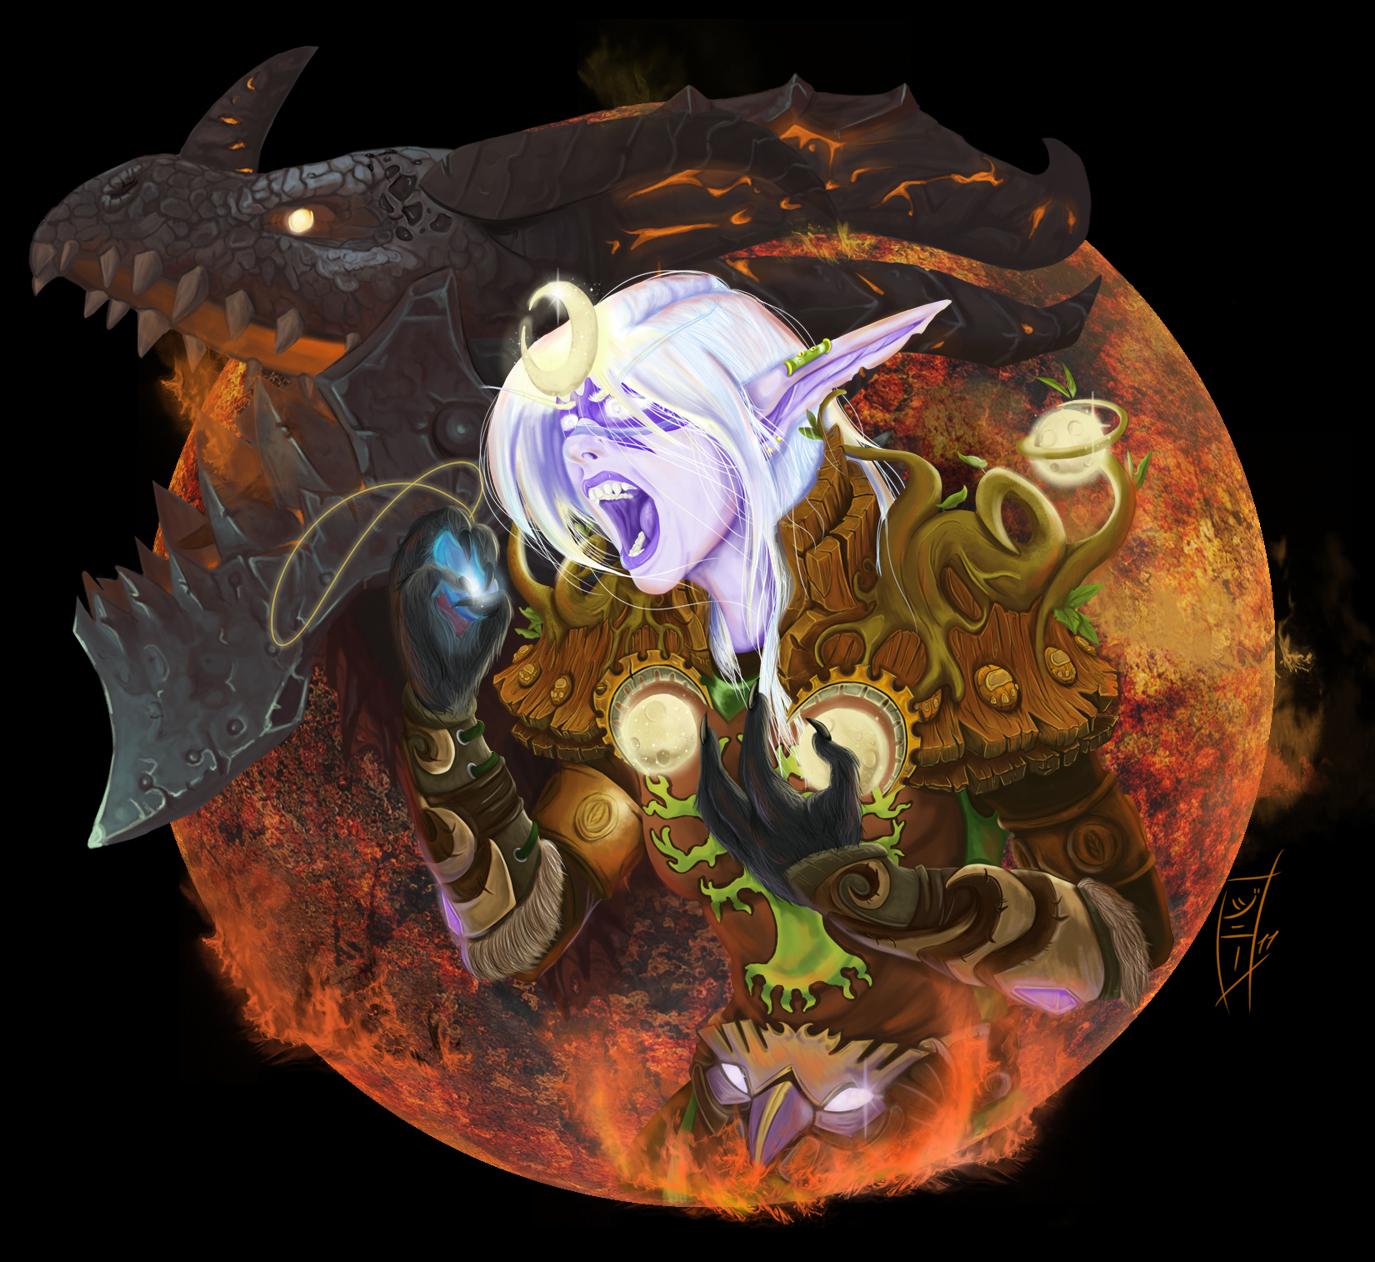 The Moon Burns by MagicalMelonBall